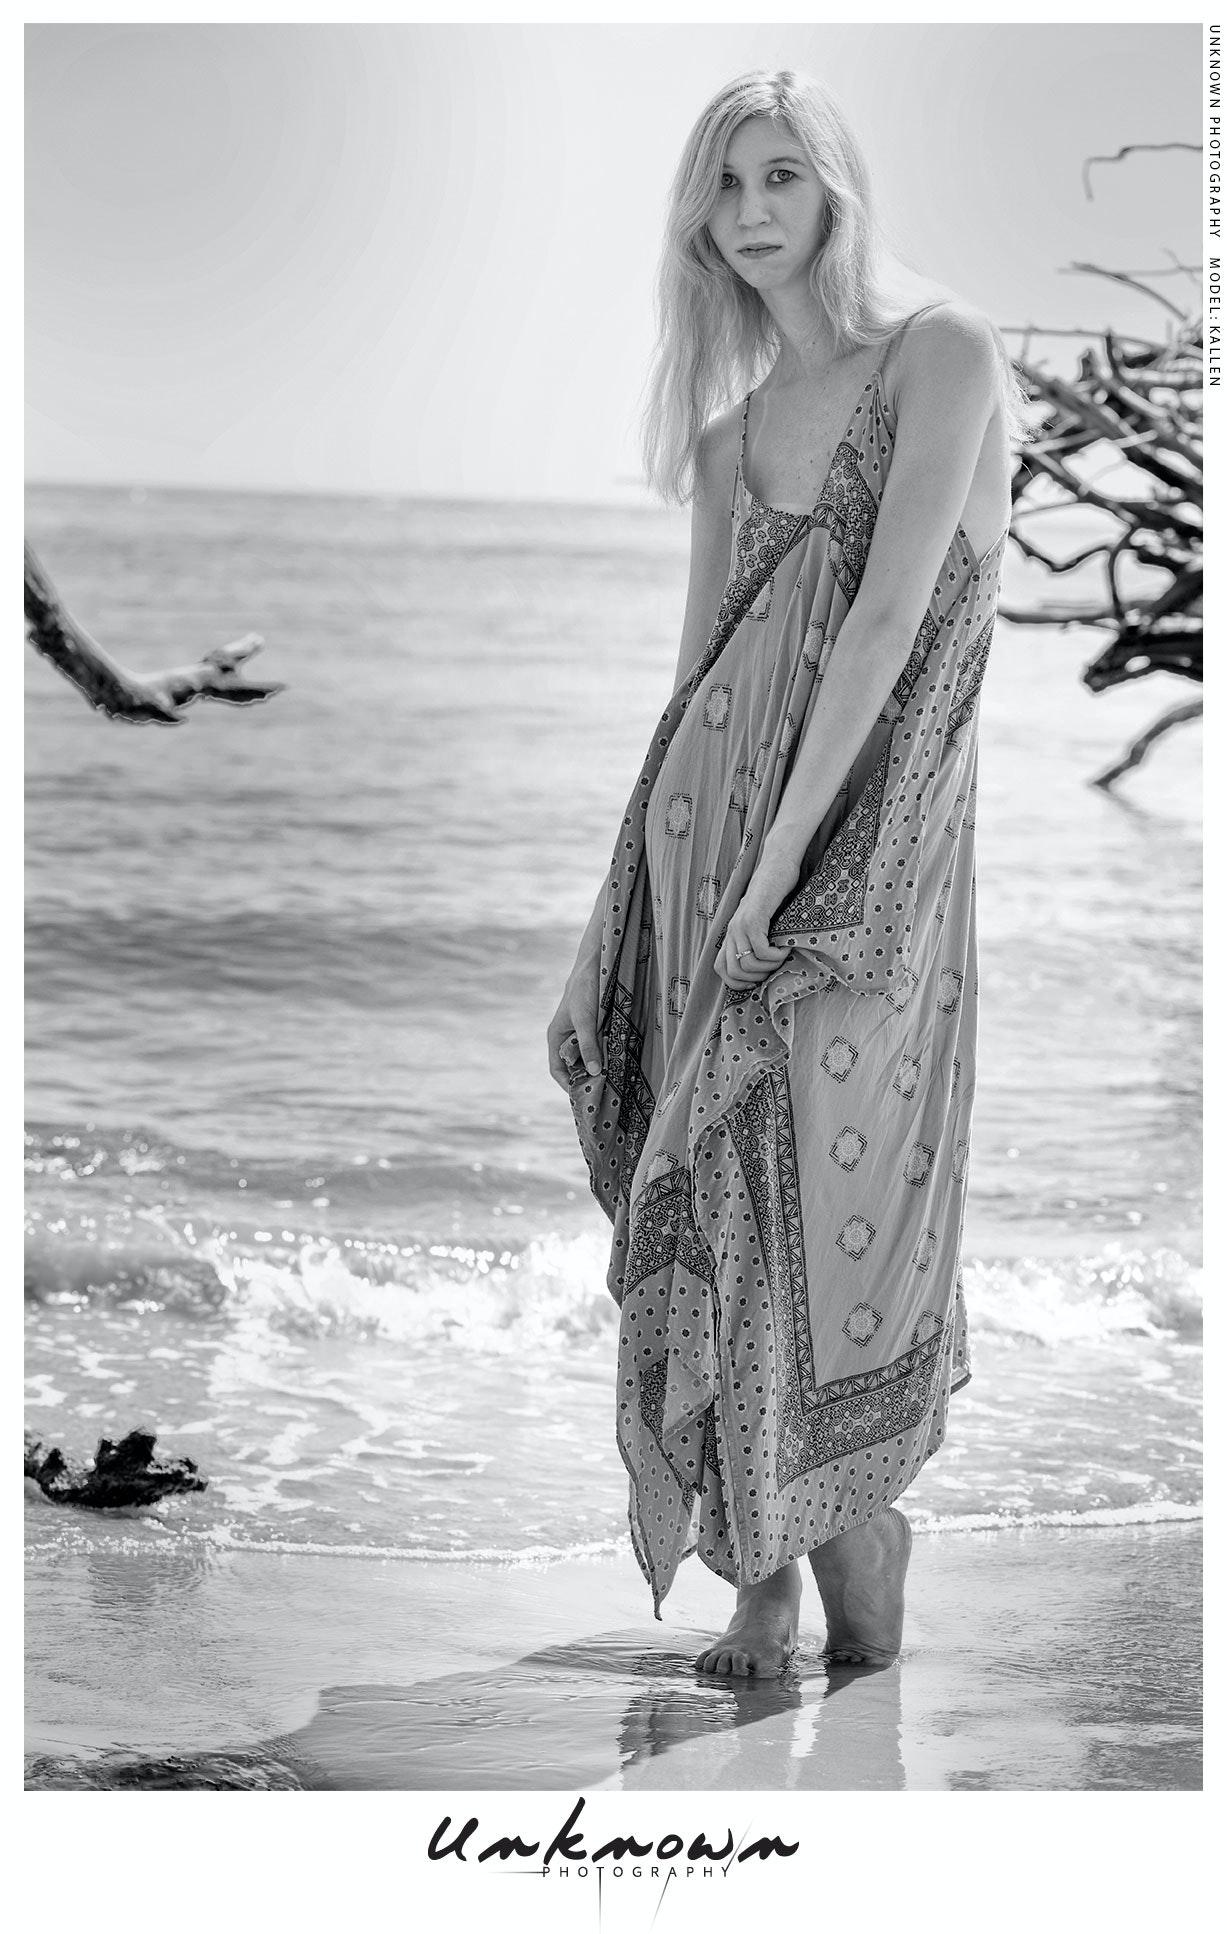 Callie Berg's Model portfolio